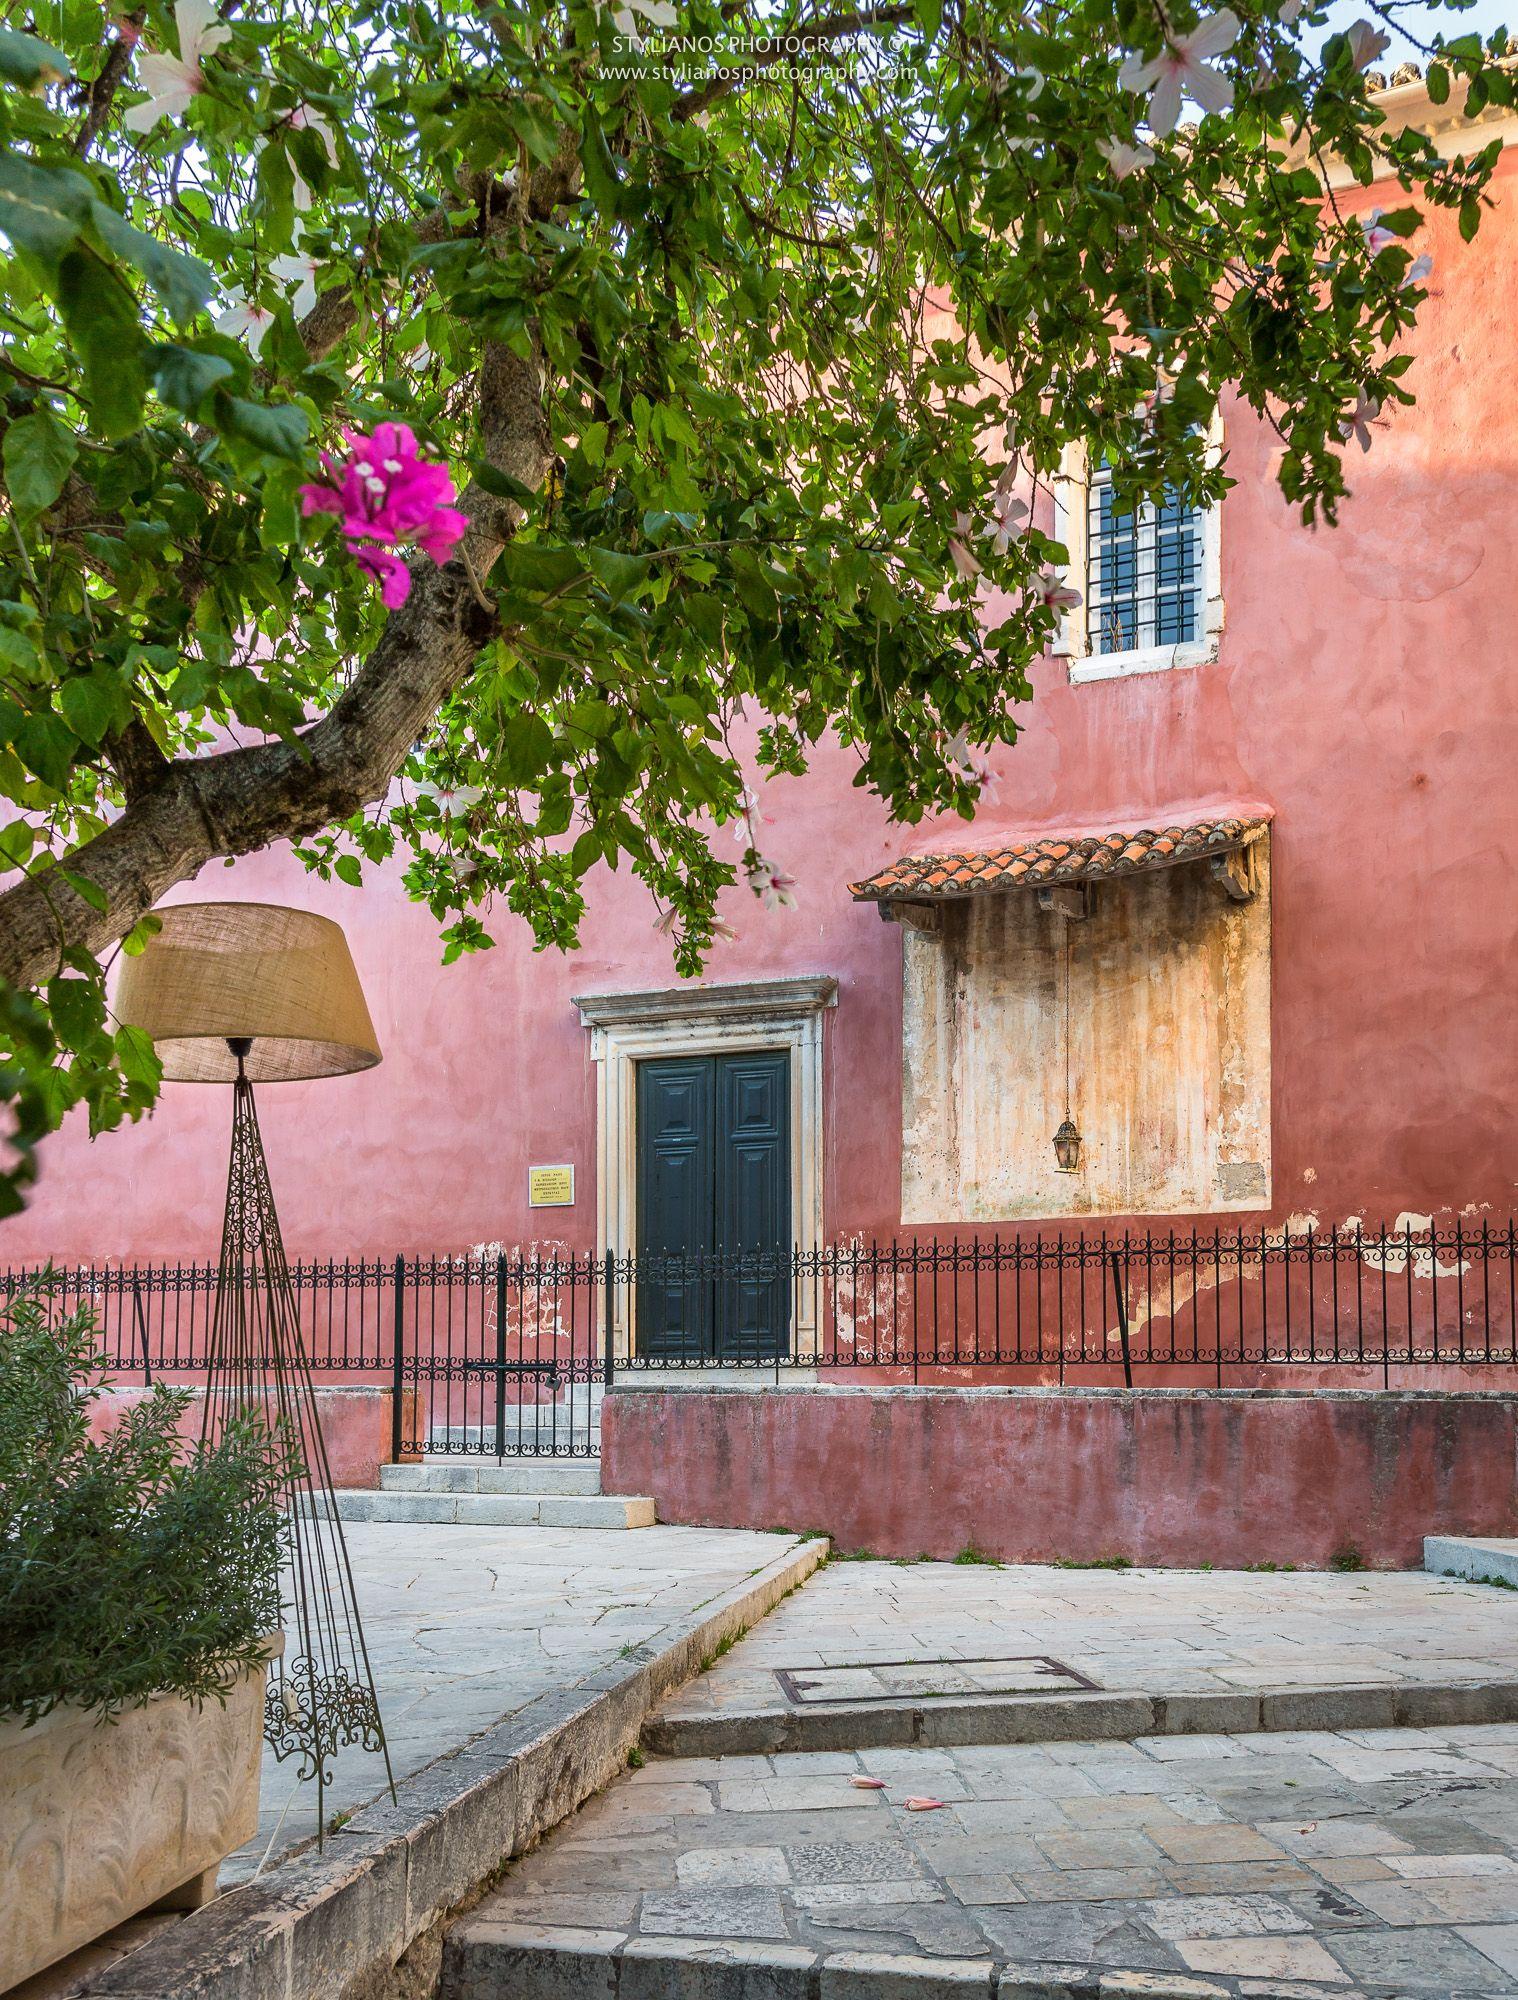 Kremasti - Corfu Old Town #corfu #kerkyra #ionianislands #greece #greeceislands  #travel #traveller  #traveling #tourism #cityshape #cityscapes #stylianosphotography #corfuartphoto #unescohellas #corfuoldtown #fineartphotography #travelawesome #panoramaphoto #cityphotography #citychapes #cityscene #kremasti